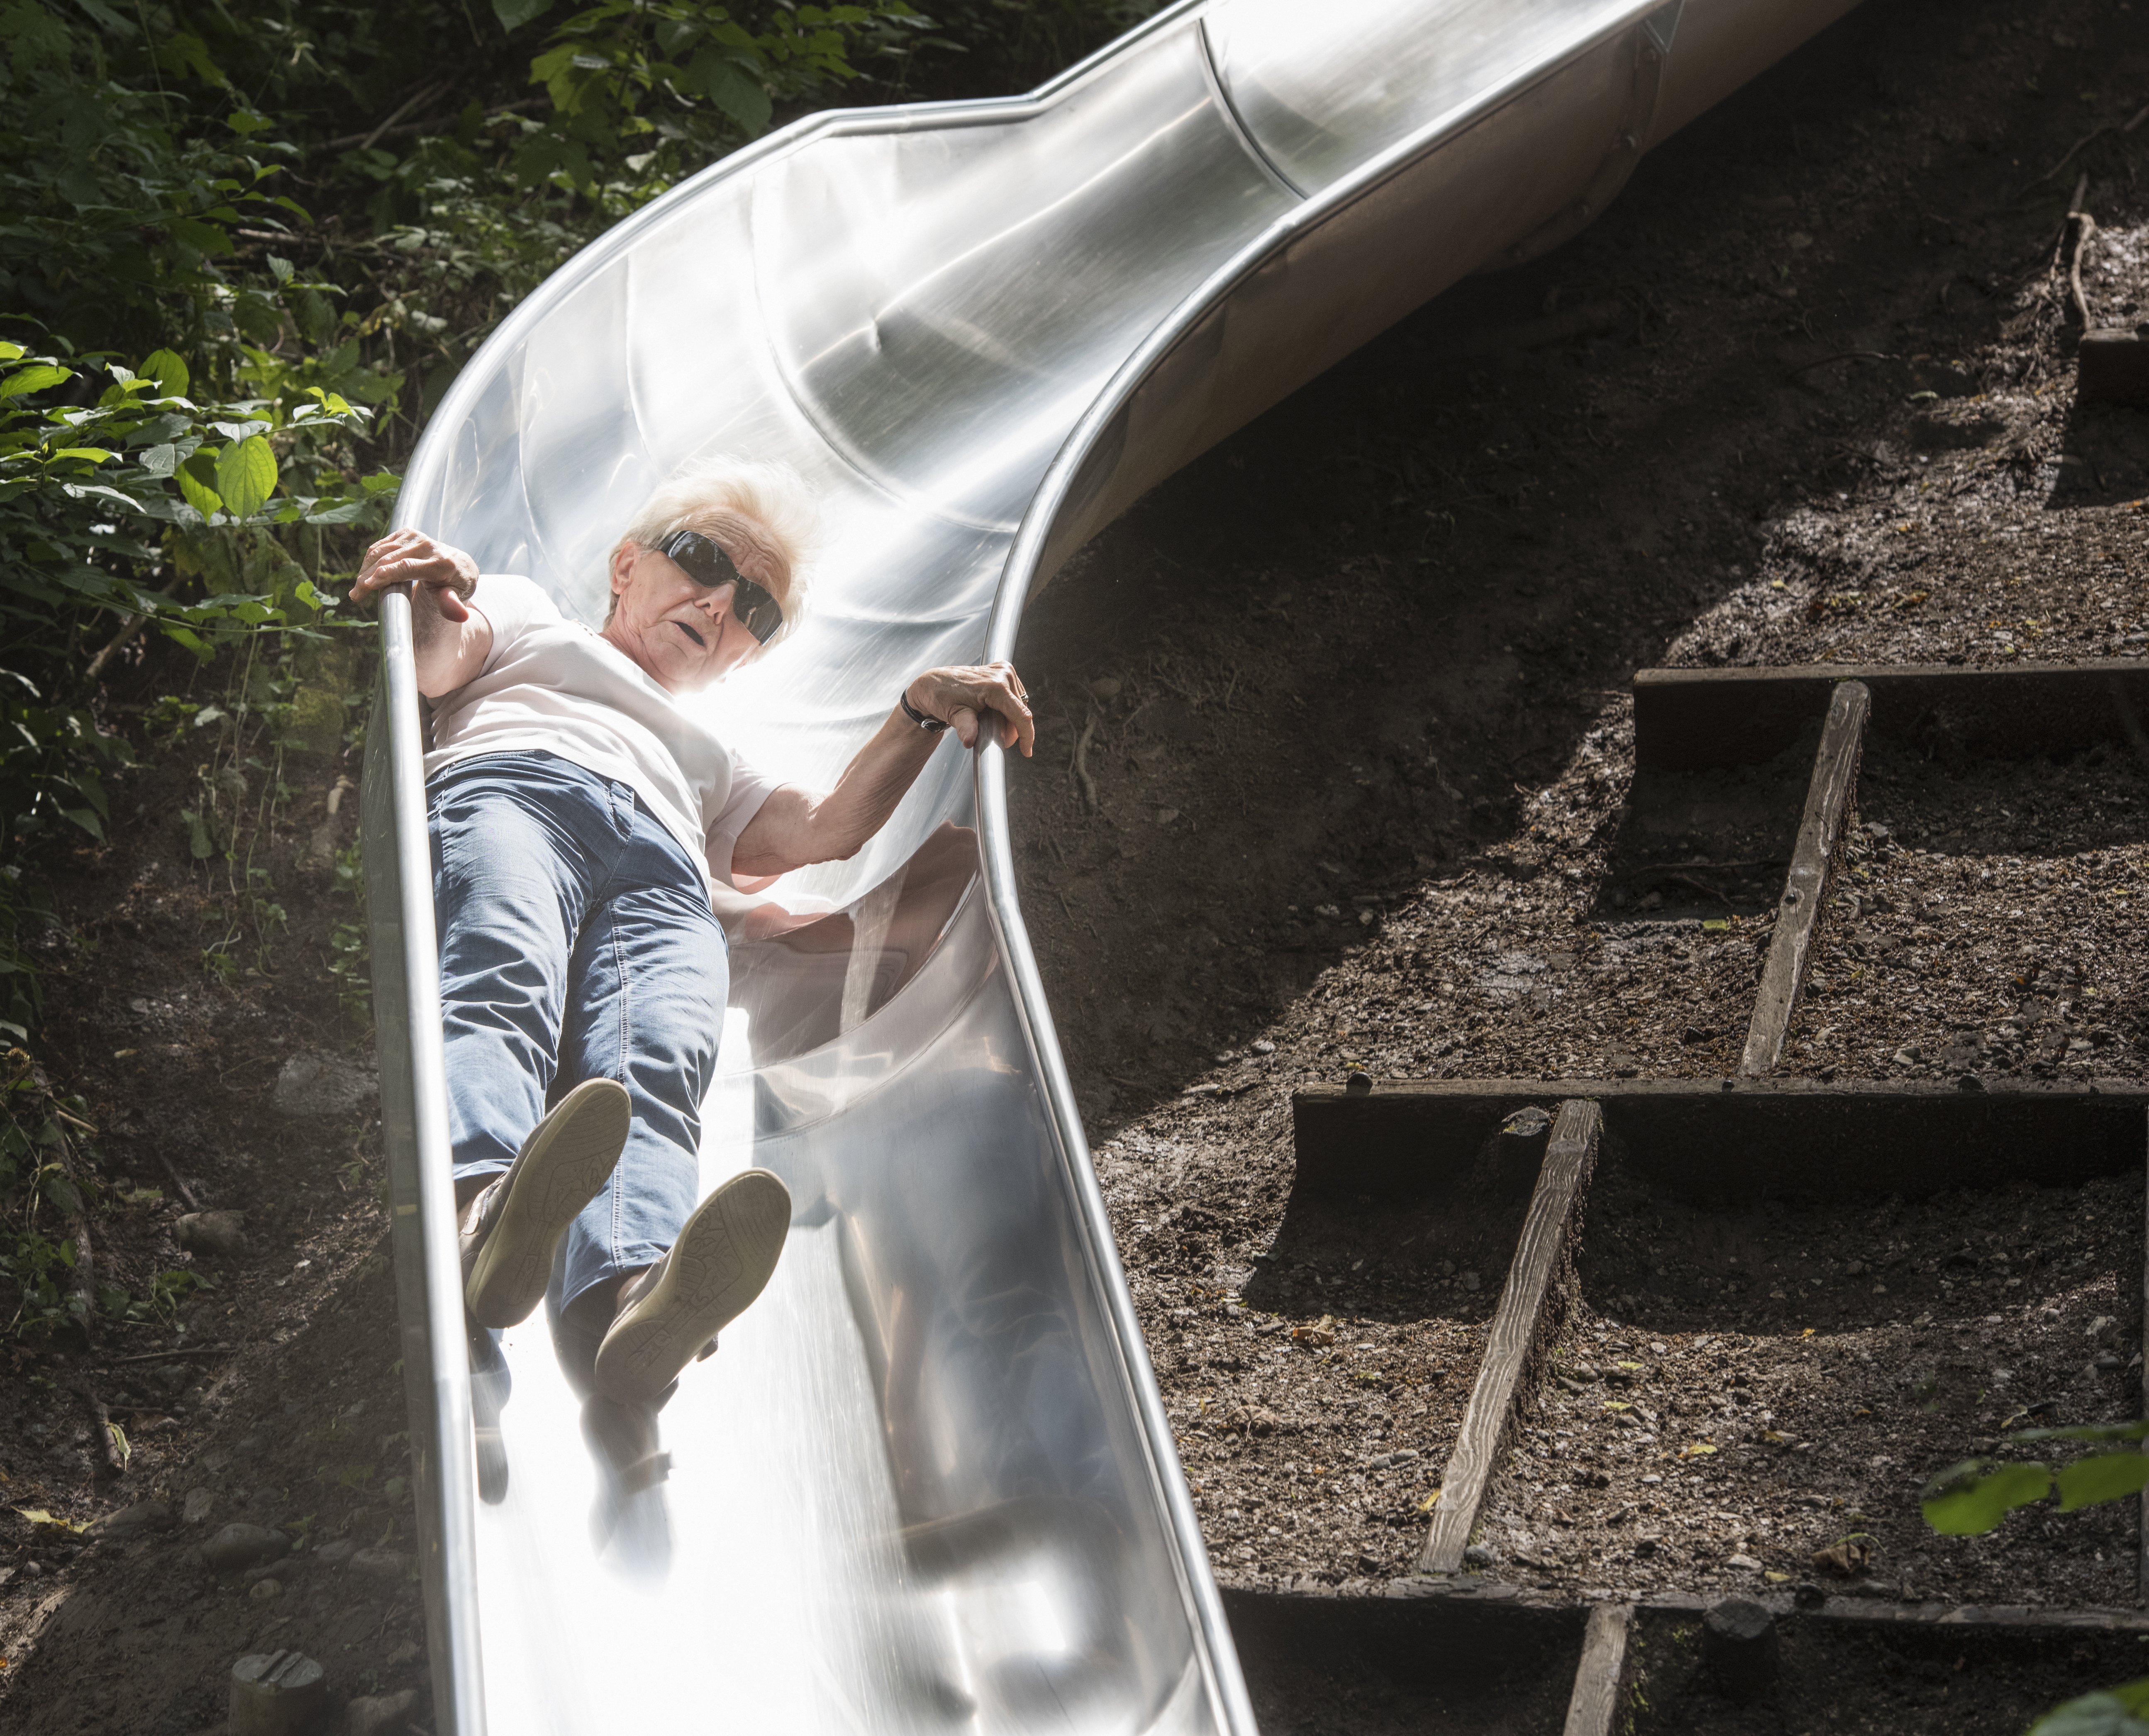 Woman sliding down playground slide